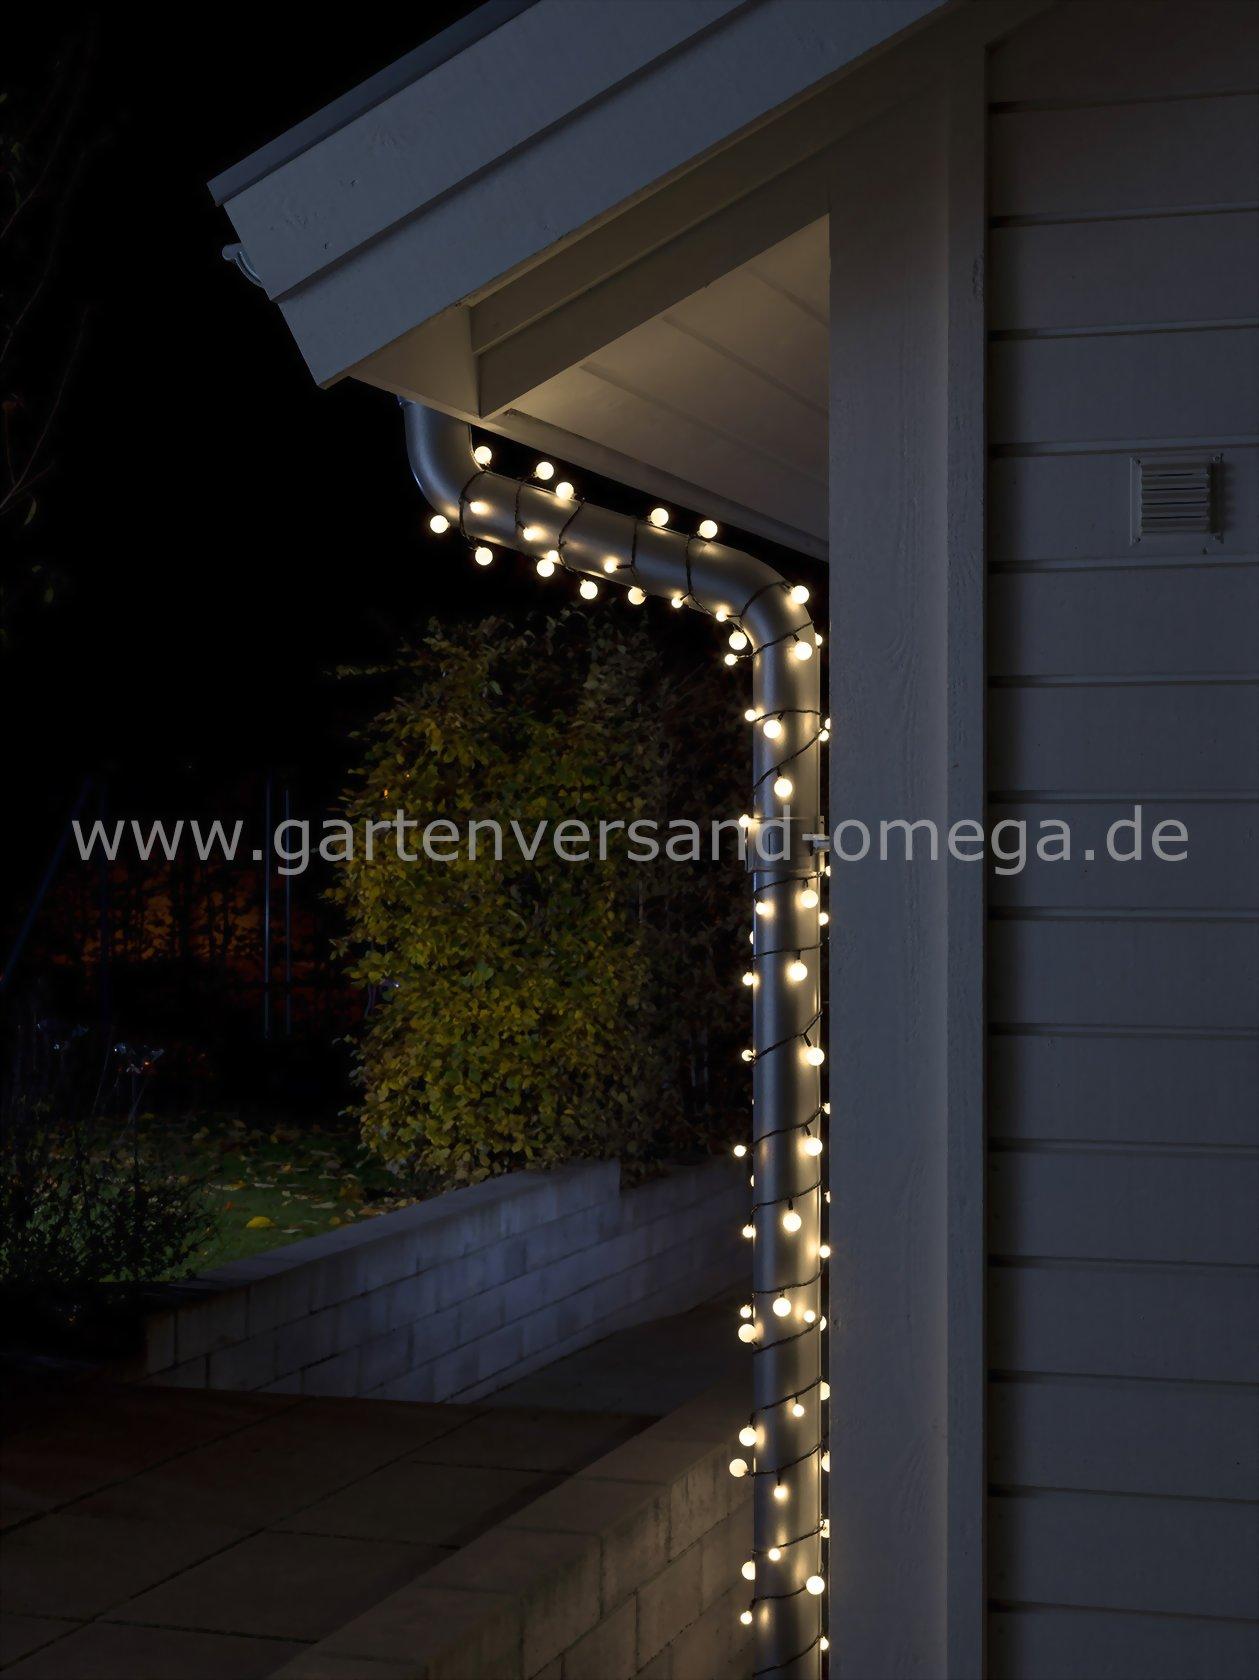 led globelichterkette kleine und gro e dioden warm wei kugellichterkette lichterkette mit. Black Bedroom Furniture Sets. Home Design Ideas